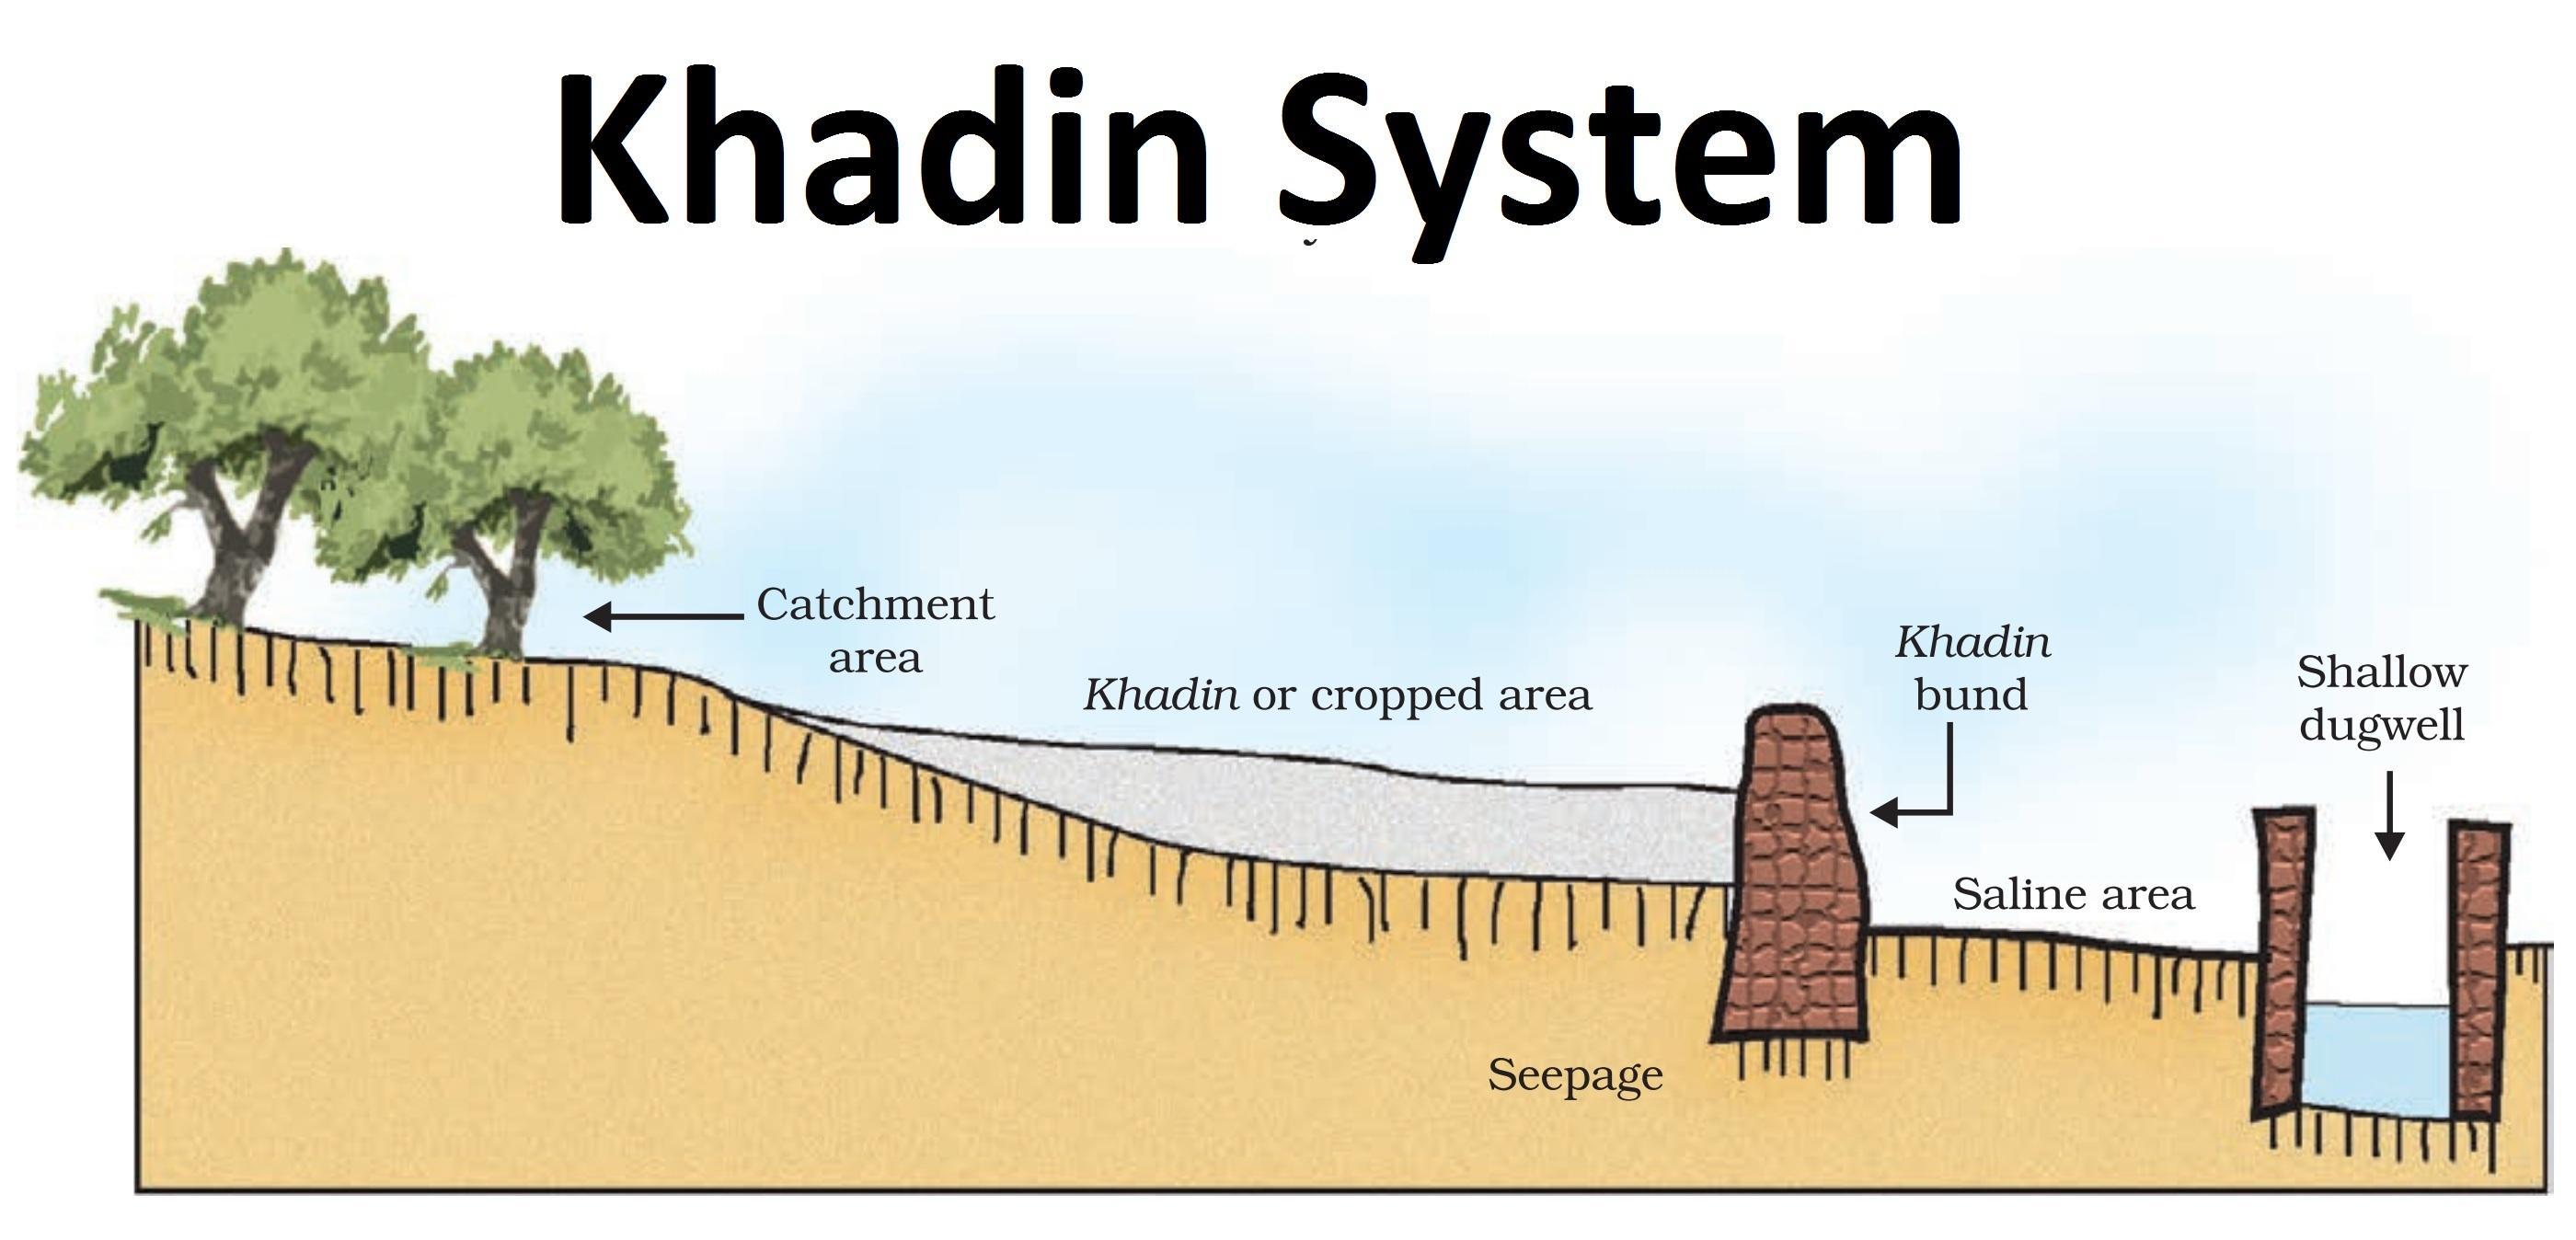 Khadin System - Teachoo.jpg